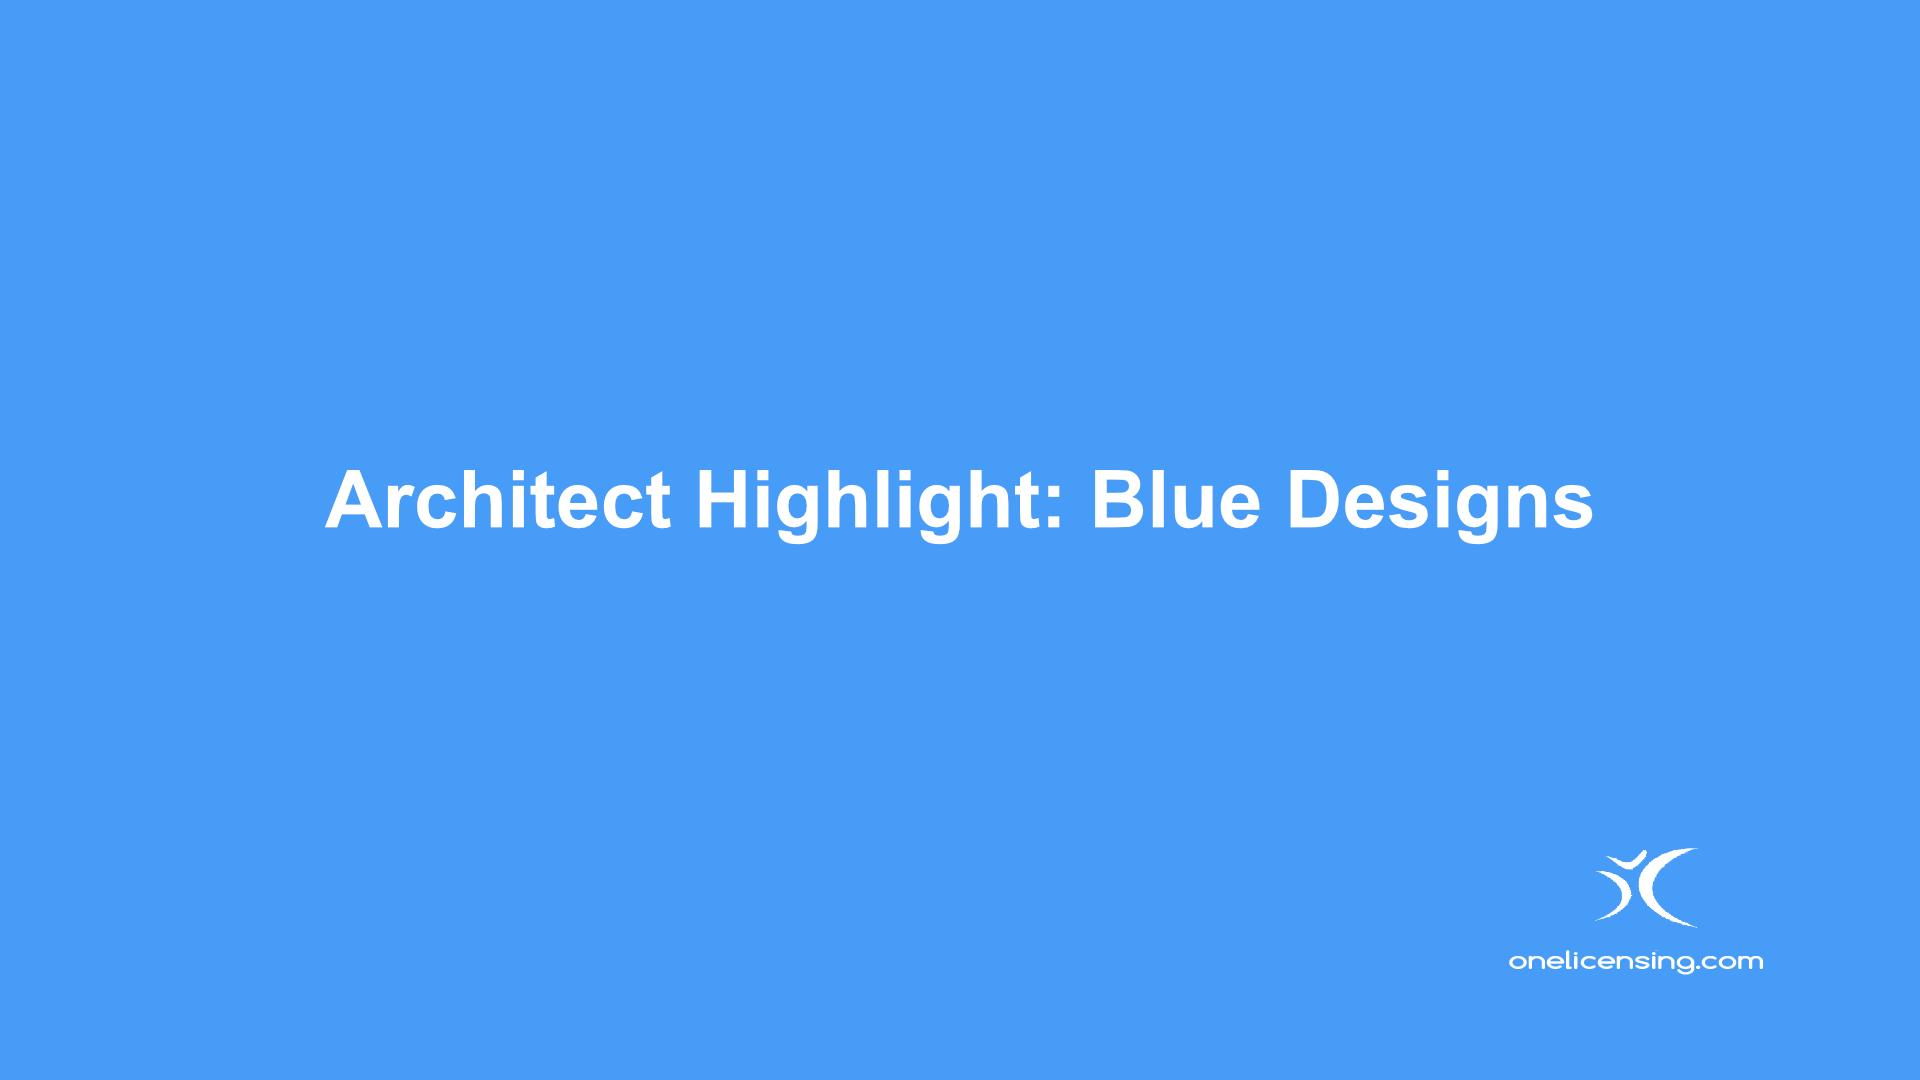 Architect Highlight Blue Designs